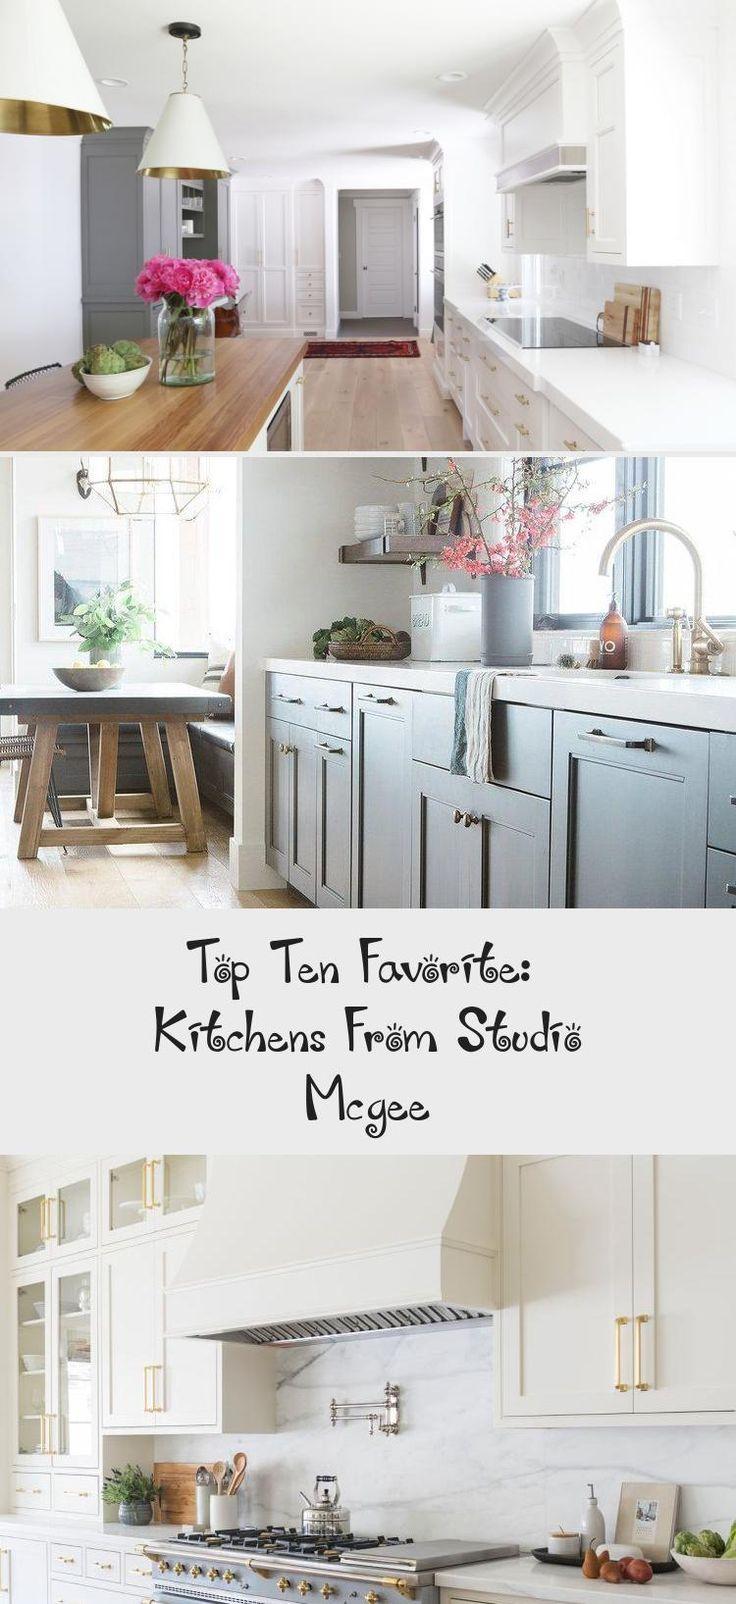 En Blog En Blog in 2020 Luxury kitchens, Studio mcgee